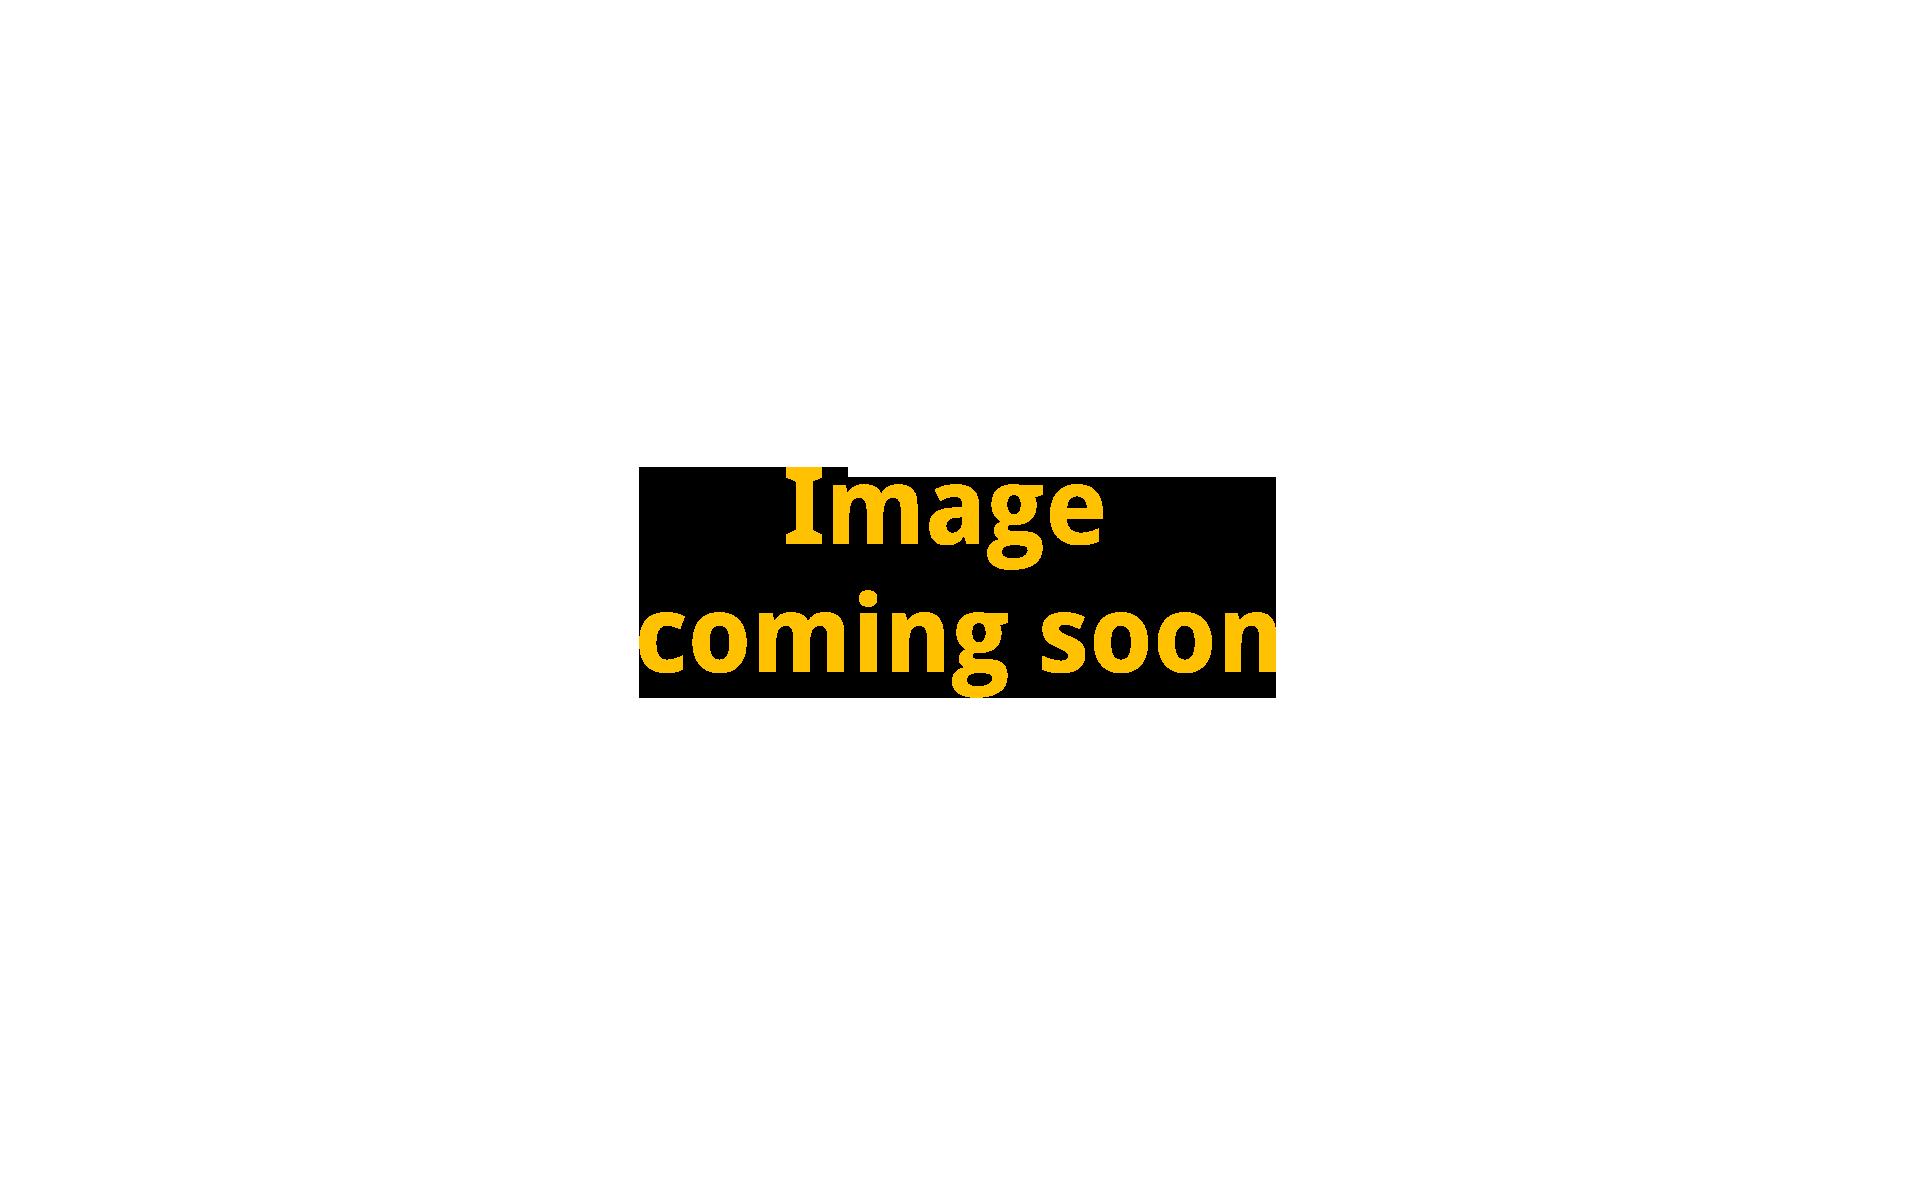 Testpot Afghan Tan 55ml/60ml